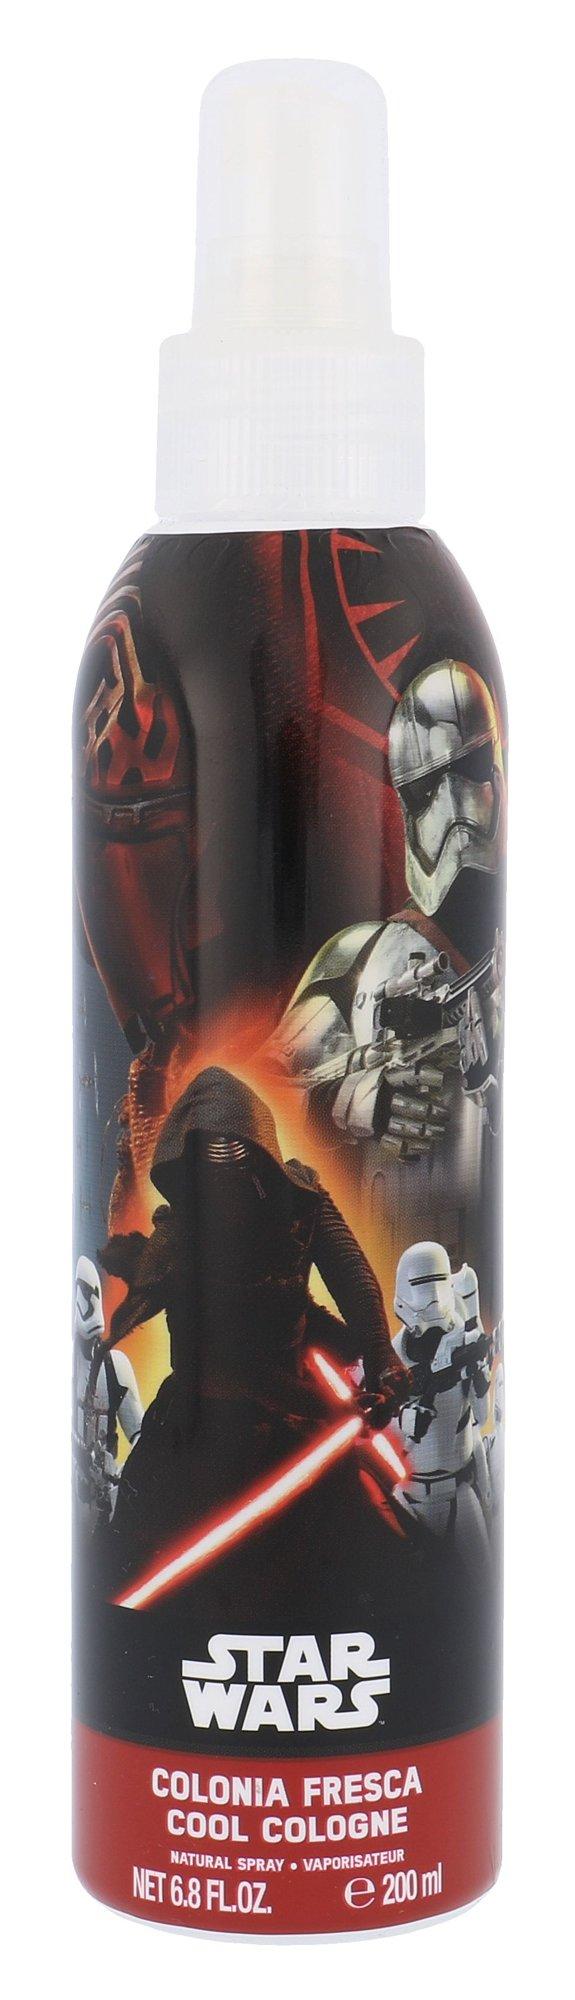 Star Wars Star Wars Tělový spray 200ml